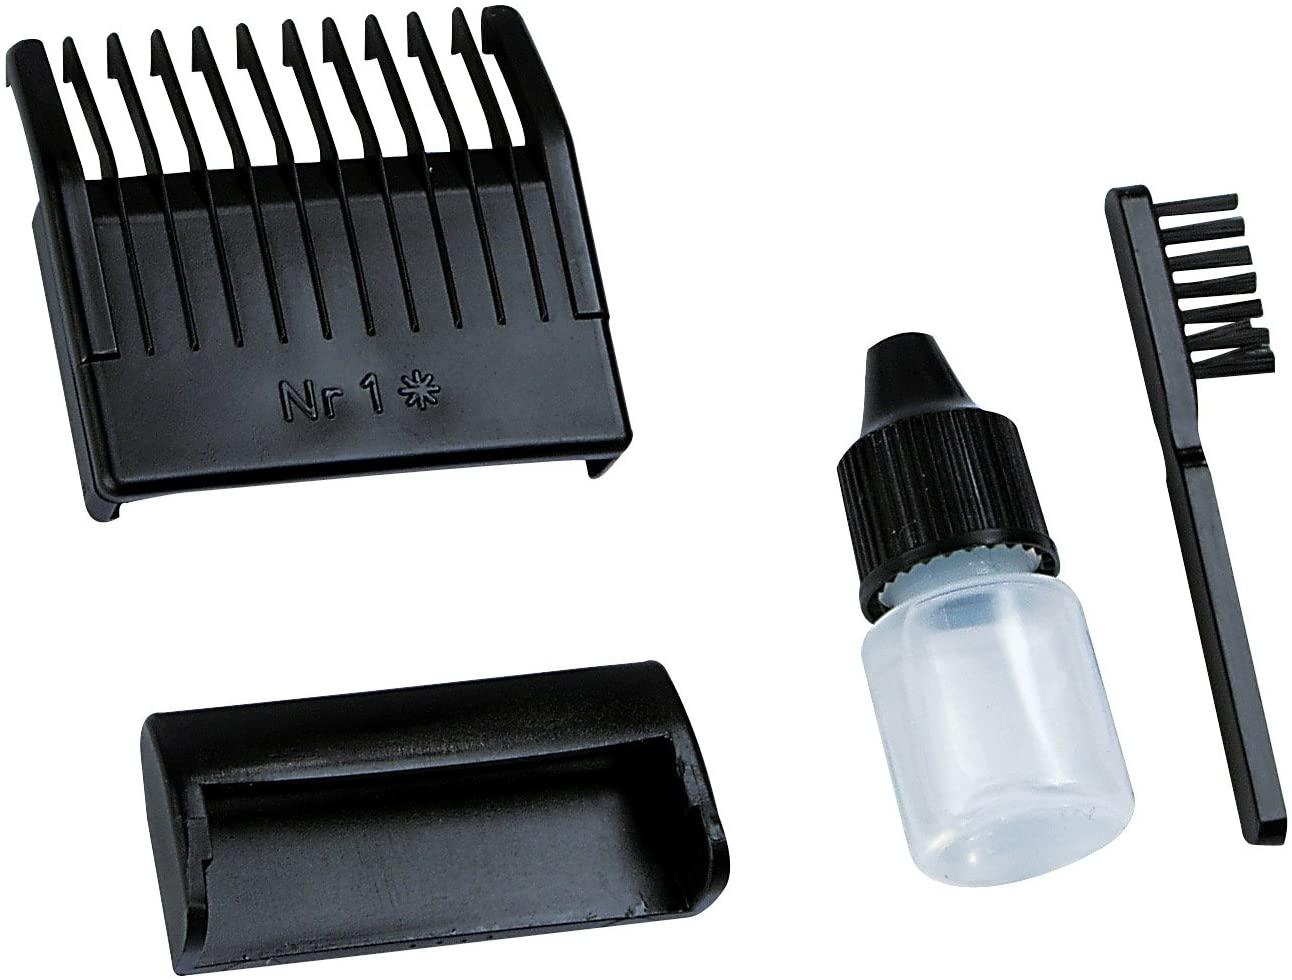 Moser 1173 - 0250 hair / beard trimmer opal, mains voltage enlarge